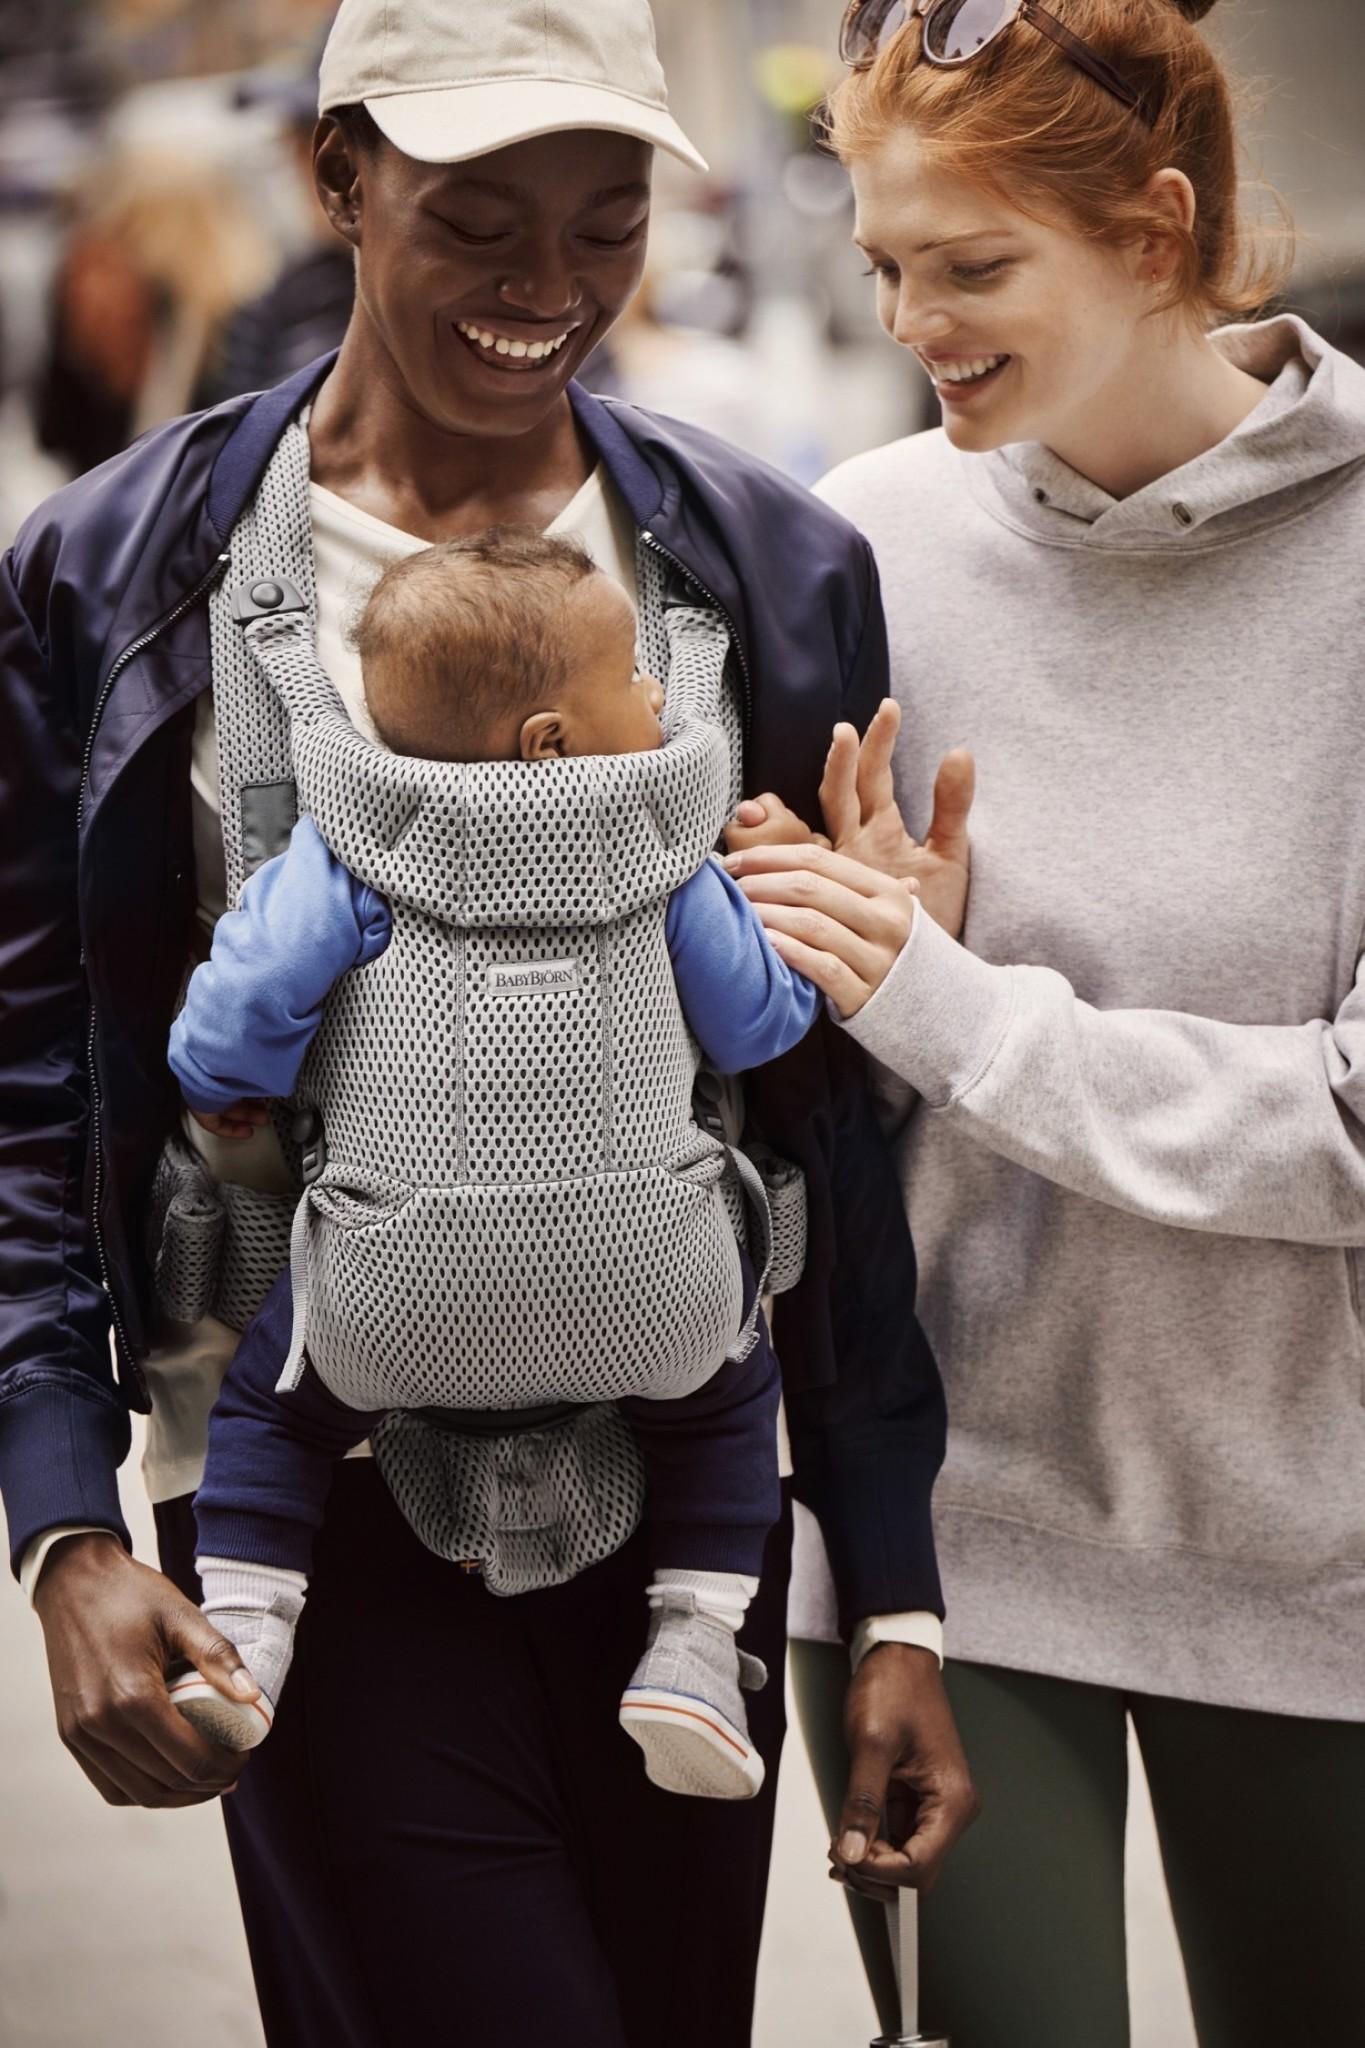 BABYBJÖRN BabyBjörn Draagzak MOVE Grijs 3D Mesh